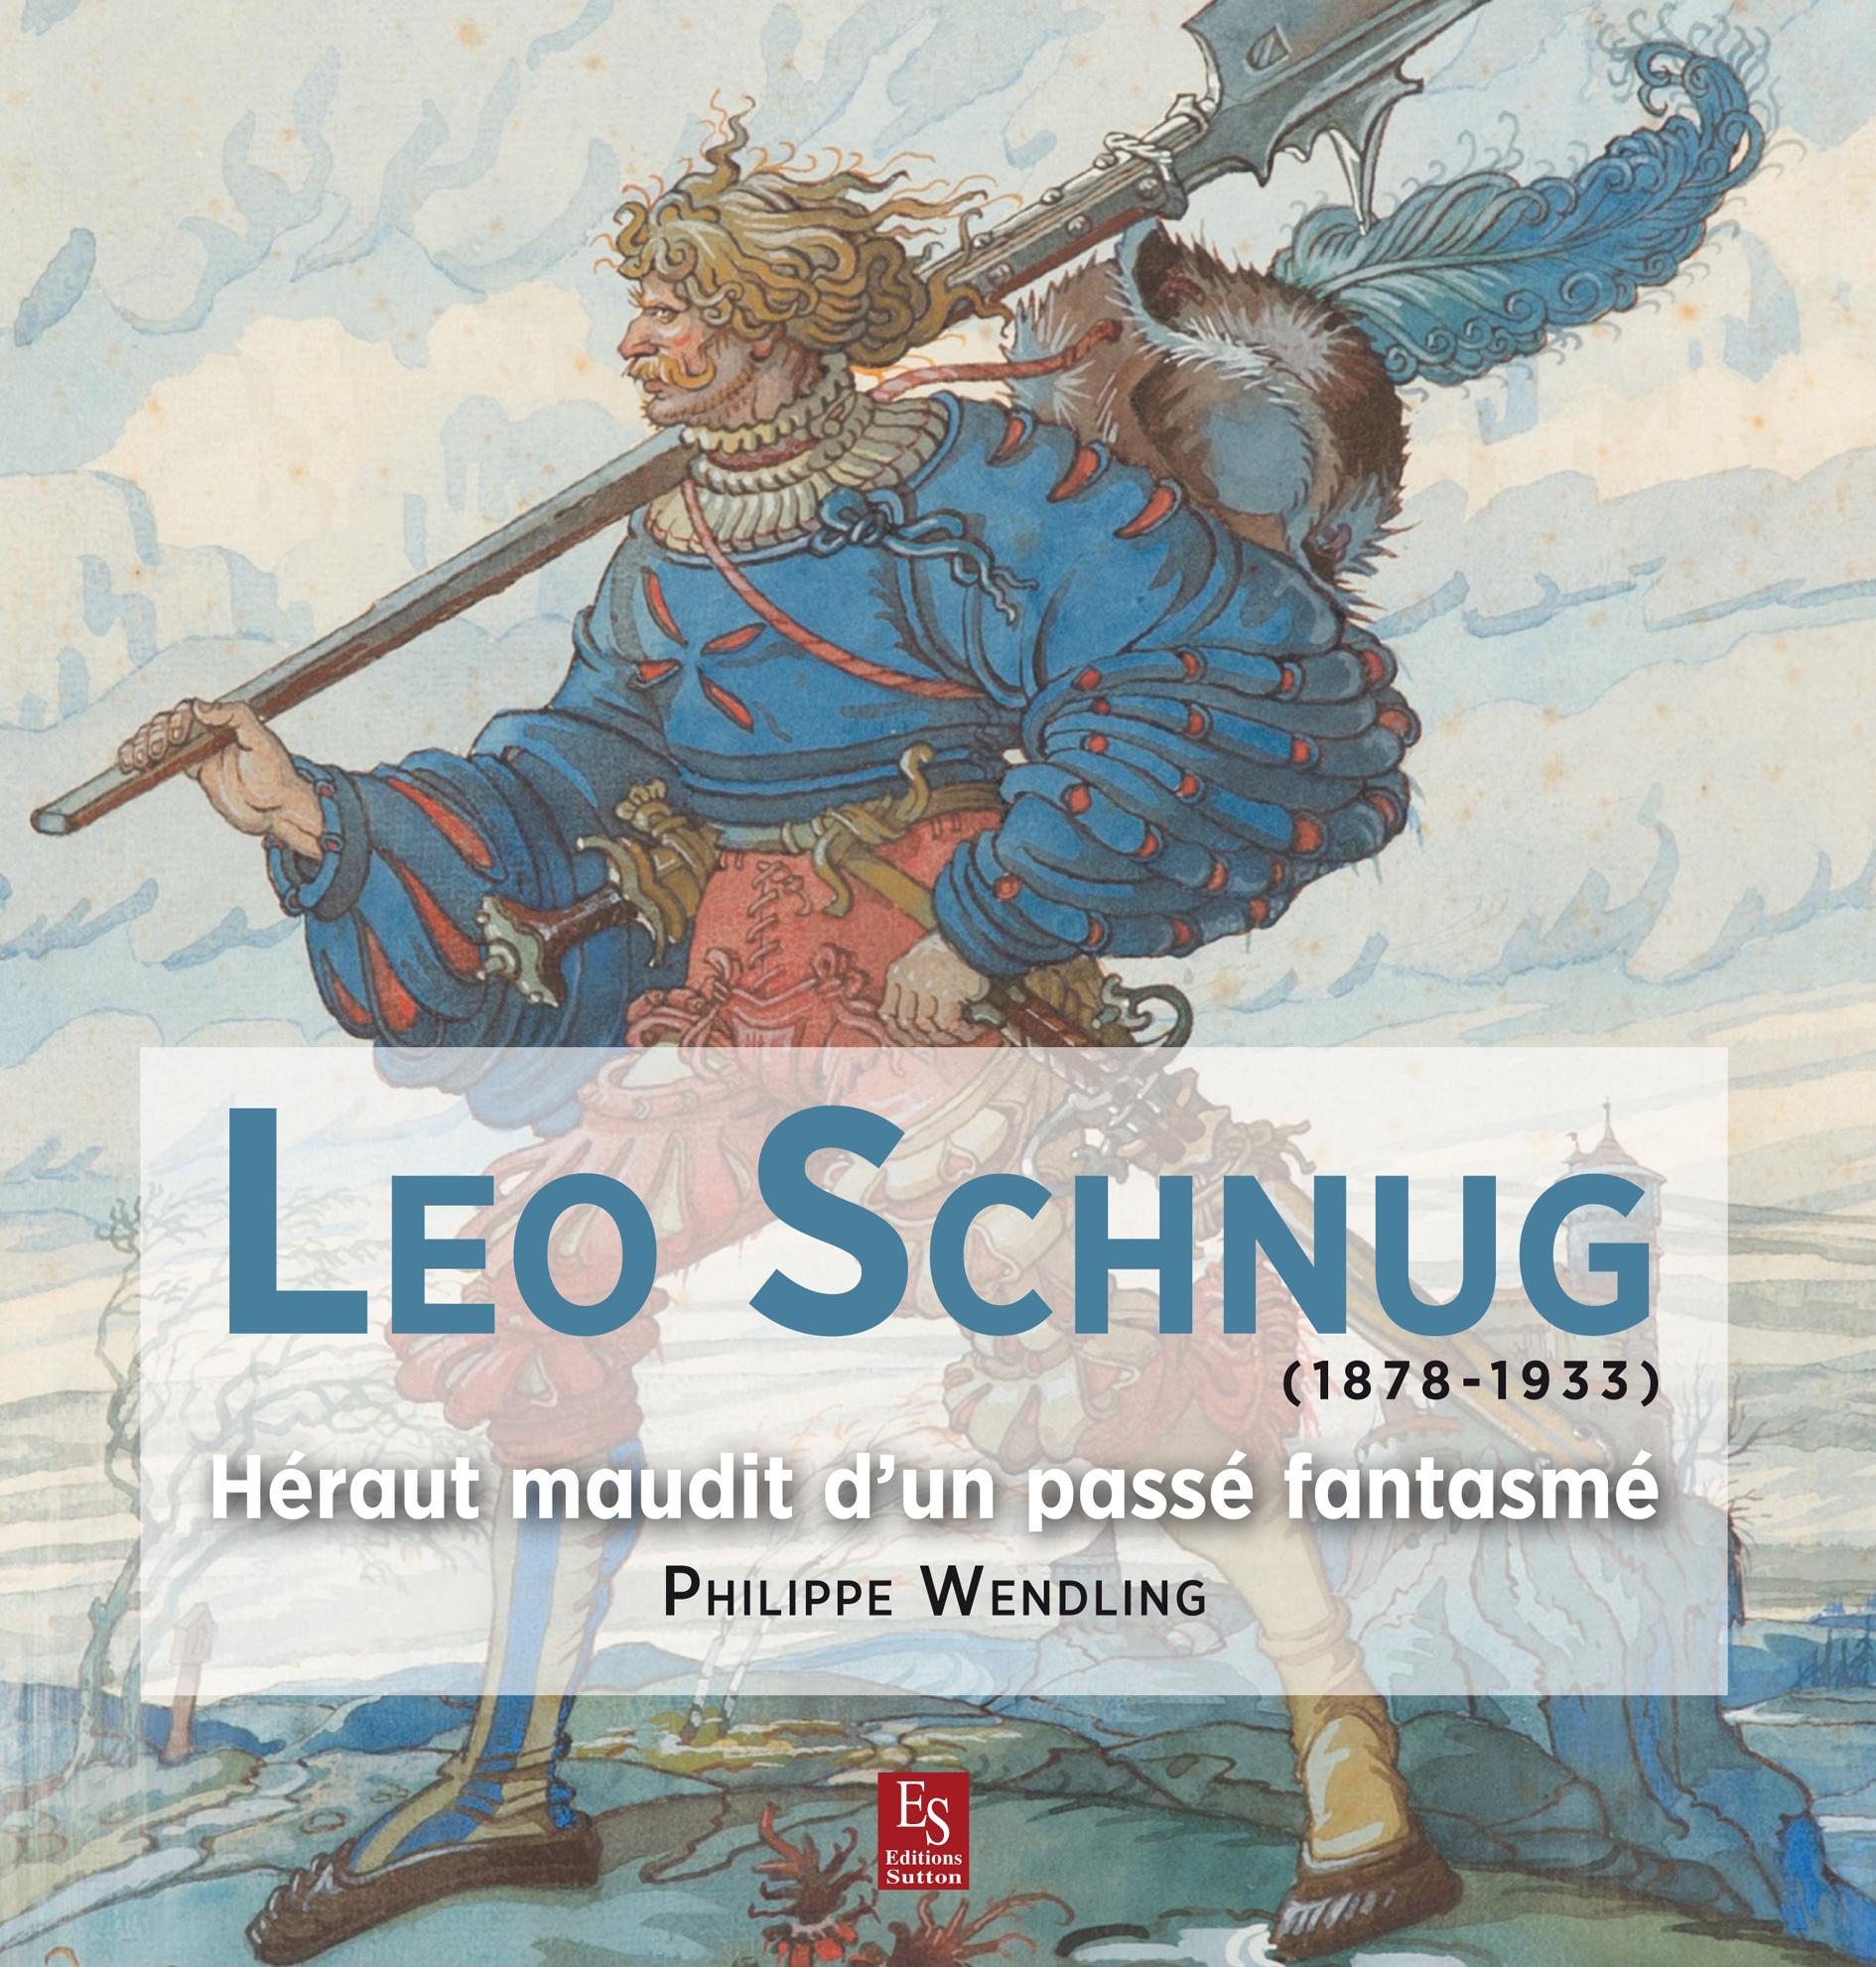 LEO SCHNUG - (1878-1933) - HERAUT MAUDIT D'UN PASSE FANTASME